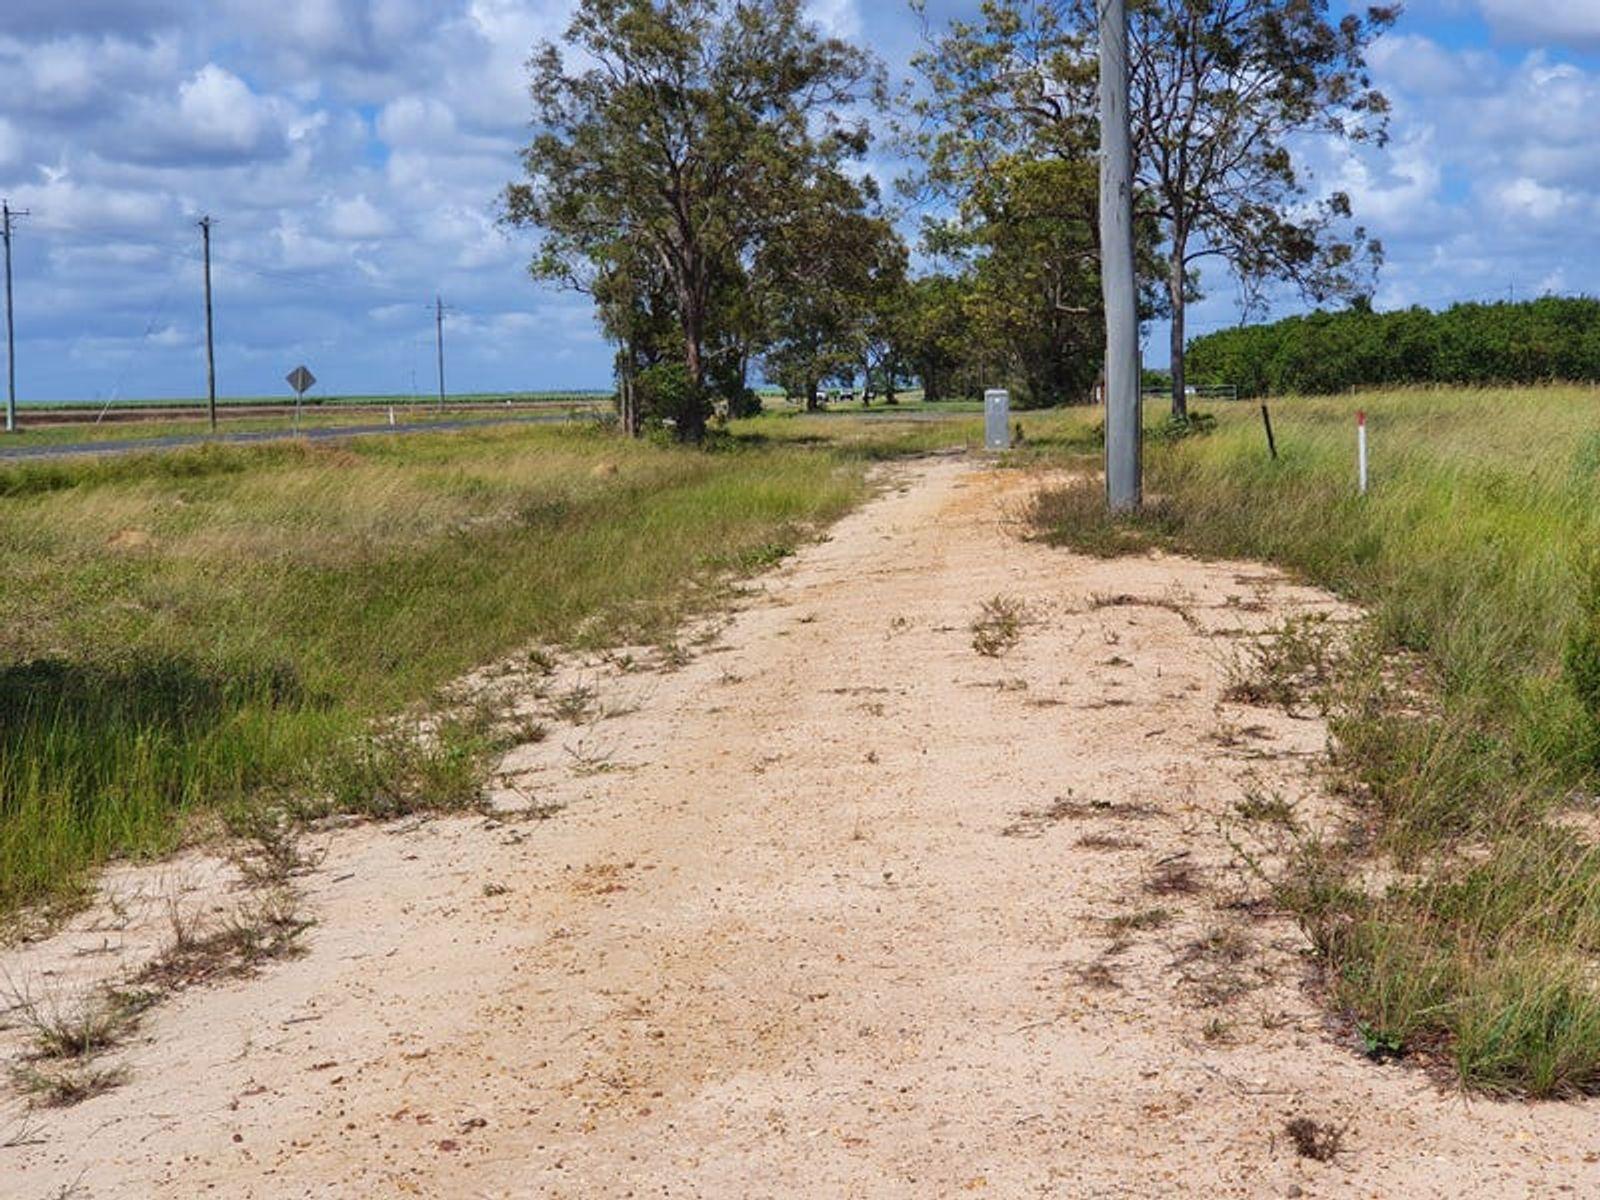 6 & 7, 0 Goodwood Road, Elliott, QLD 4670